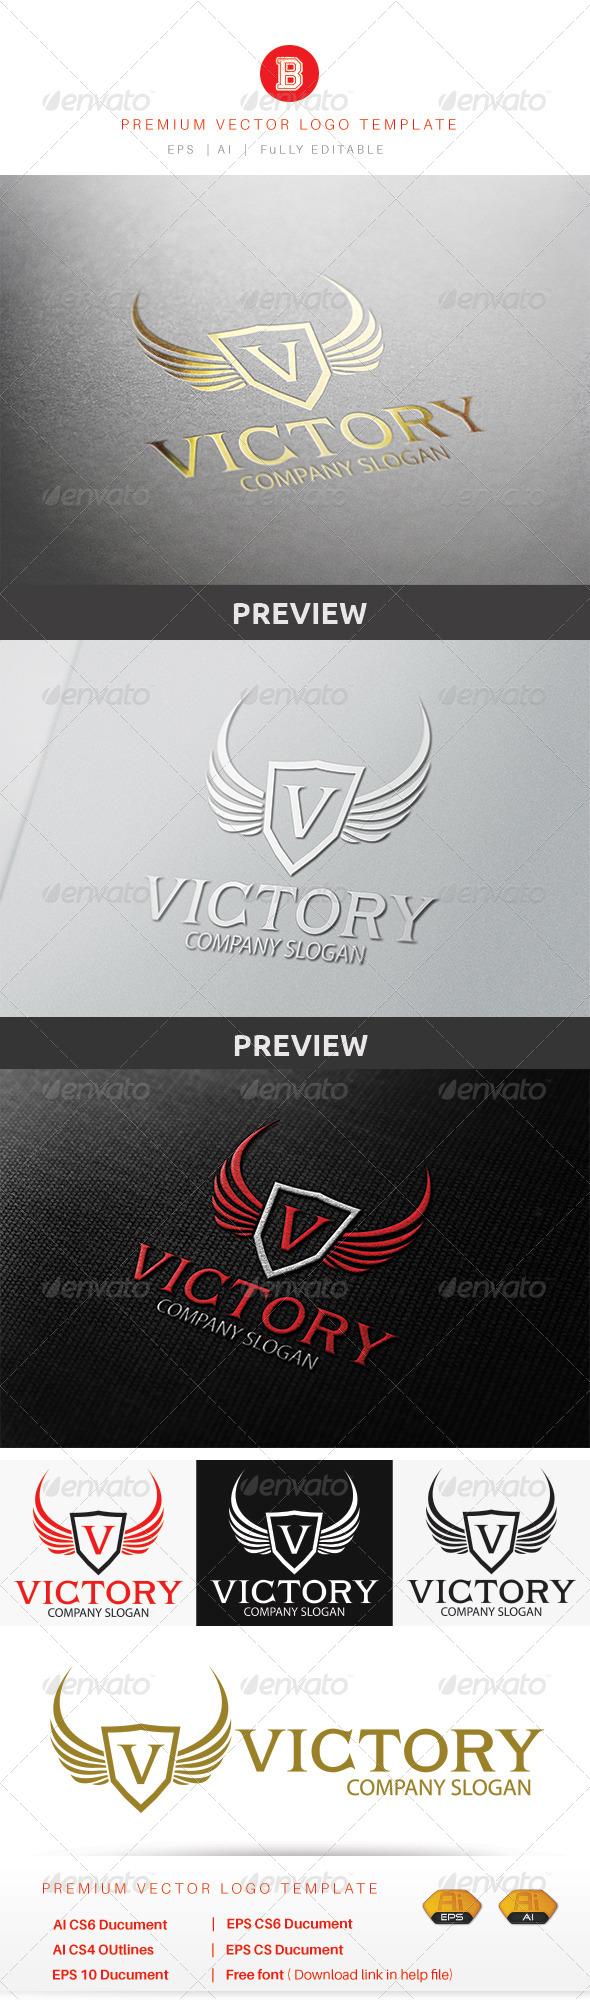 GraphicRiver Victory Logo 8615556